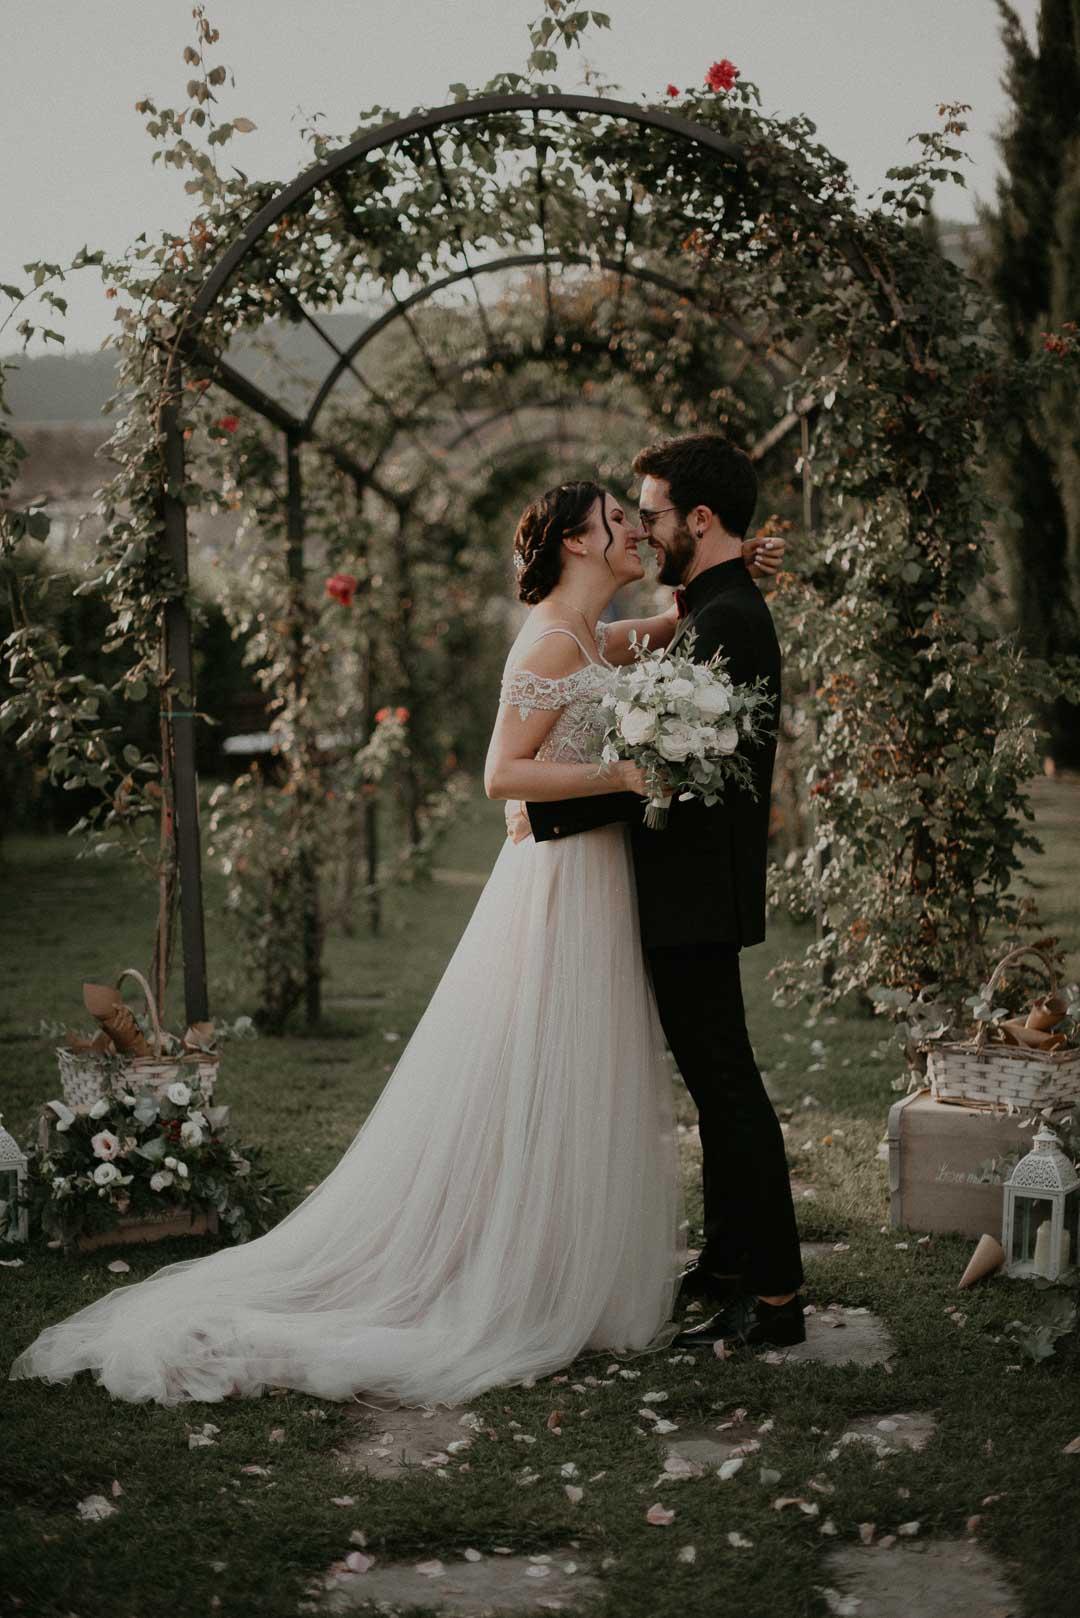 wedding-photographer-destination-fineart-bespoke-reportage-tuscany-villascorzi-vivianeizzo-spazio46-89